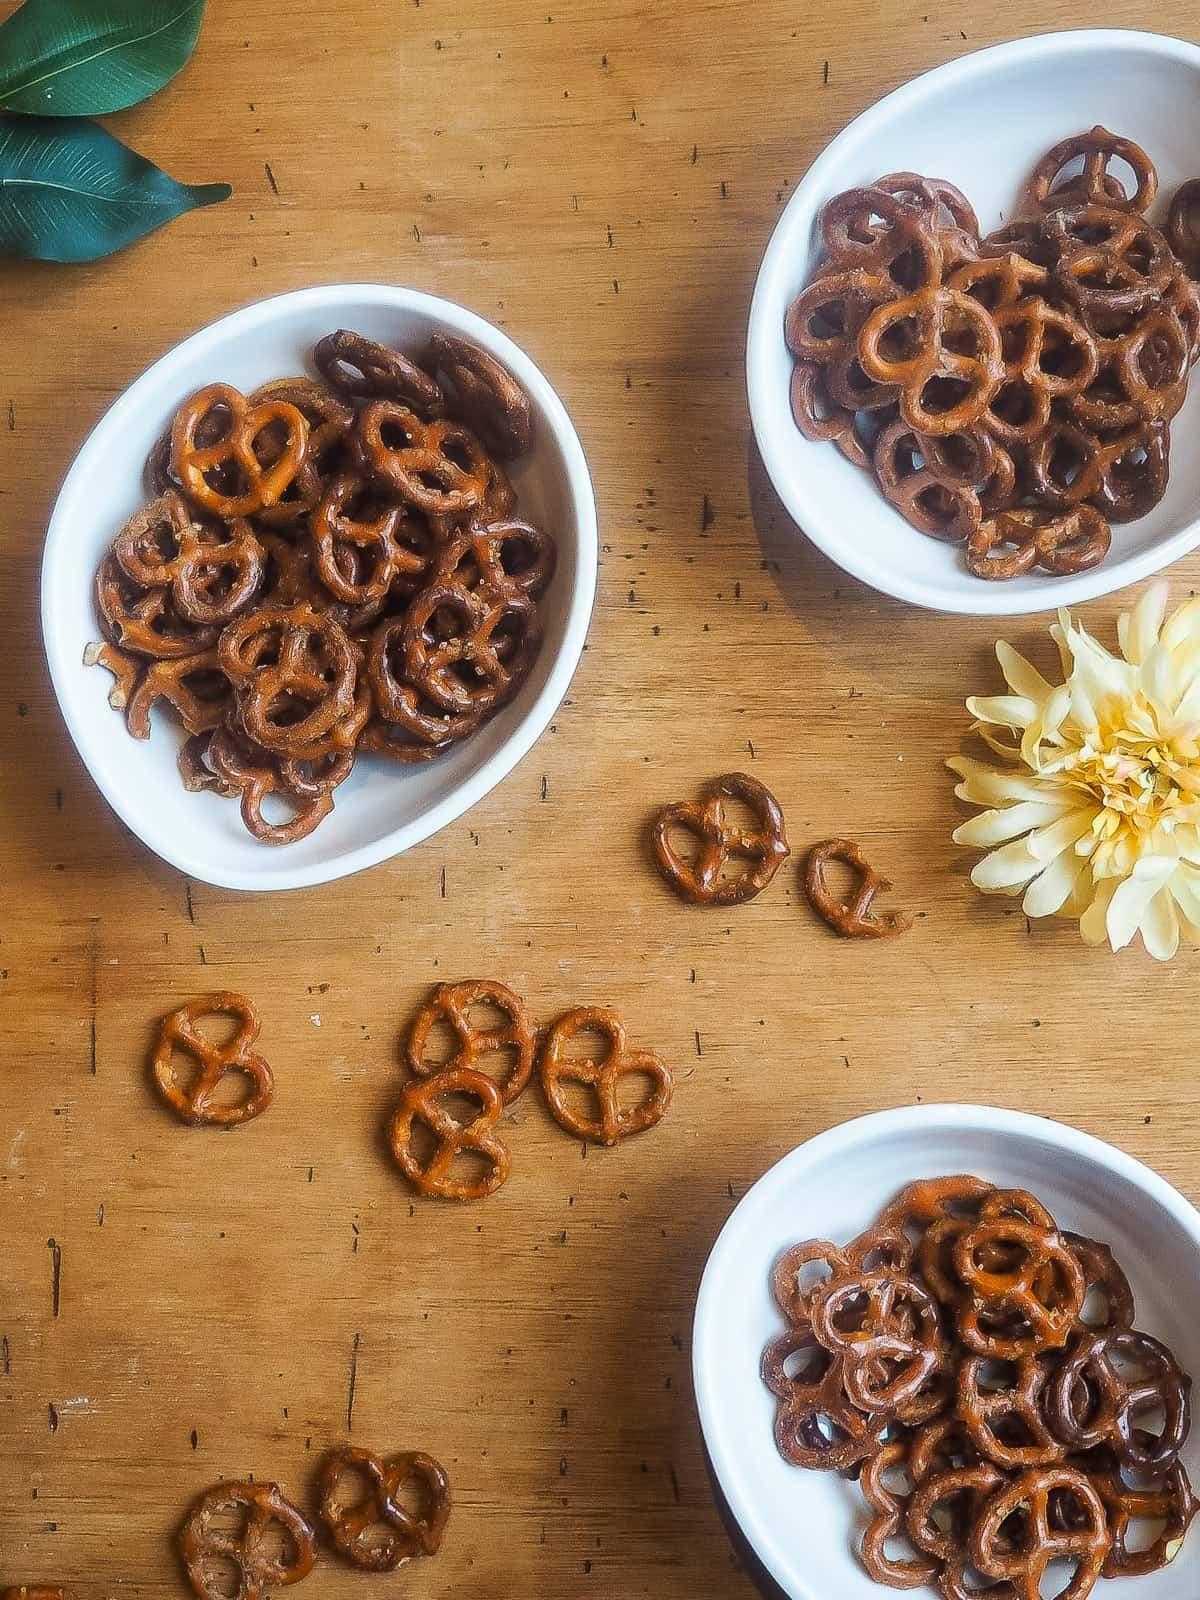 Seasoned pretzels in three white bowls on a wooden board.